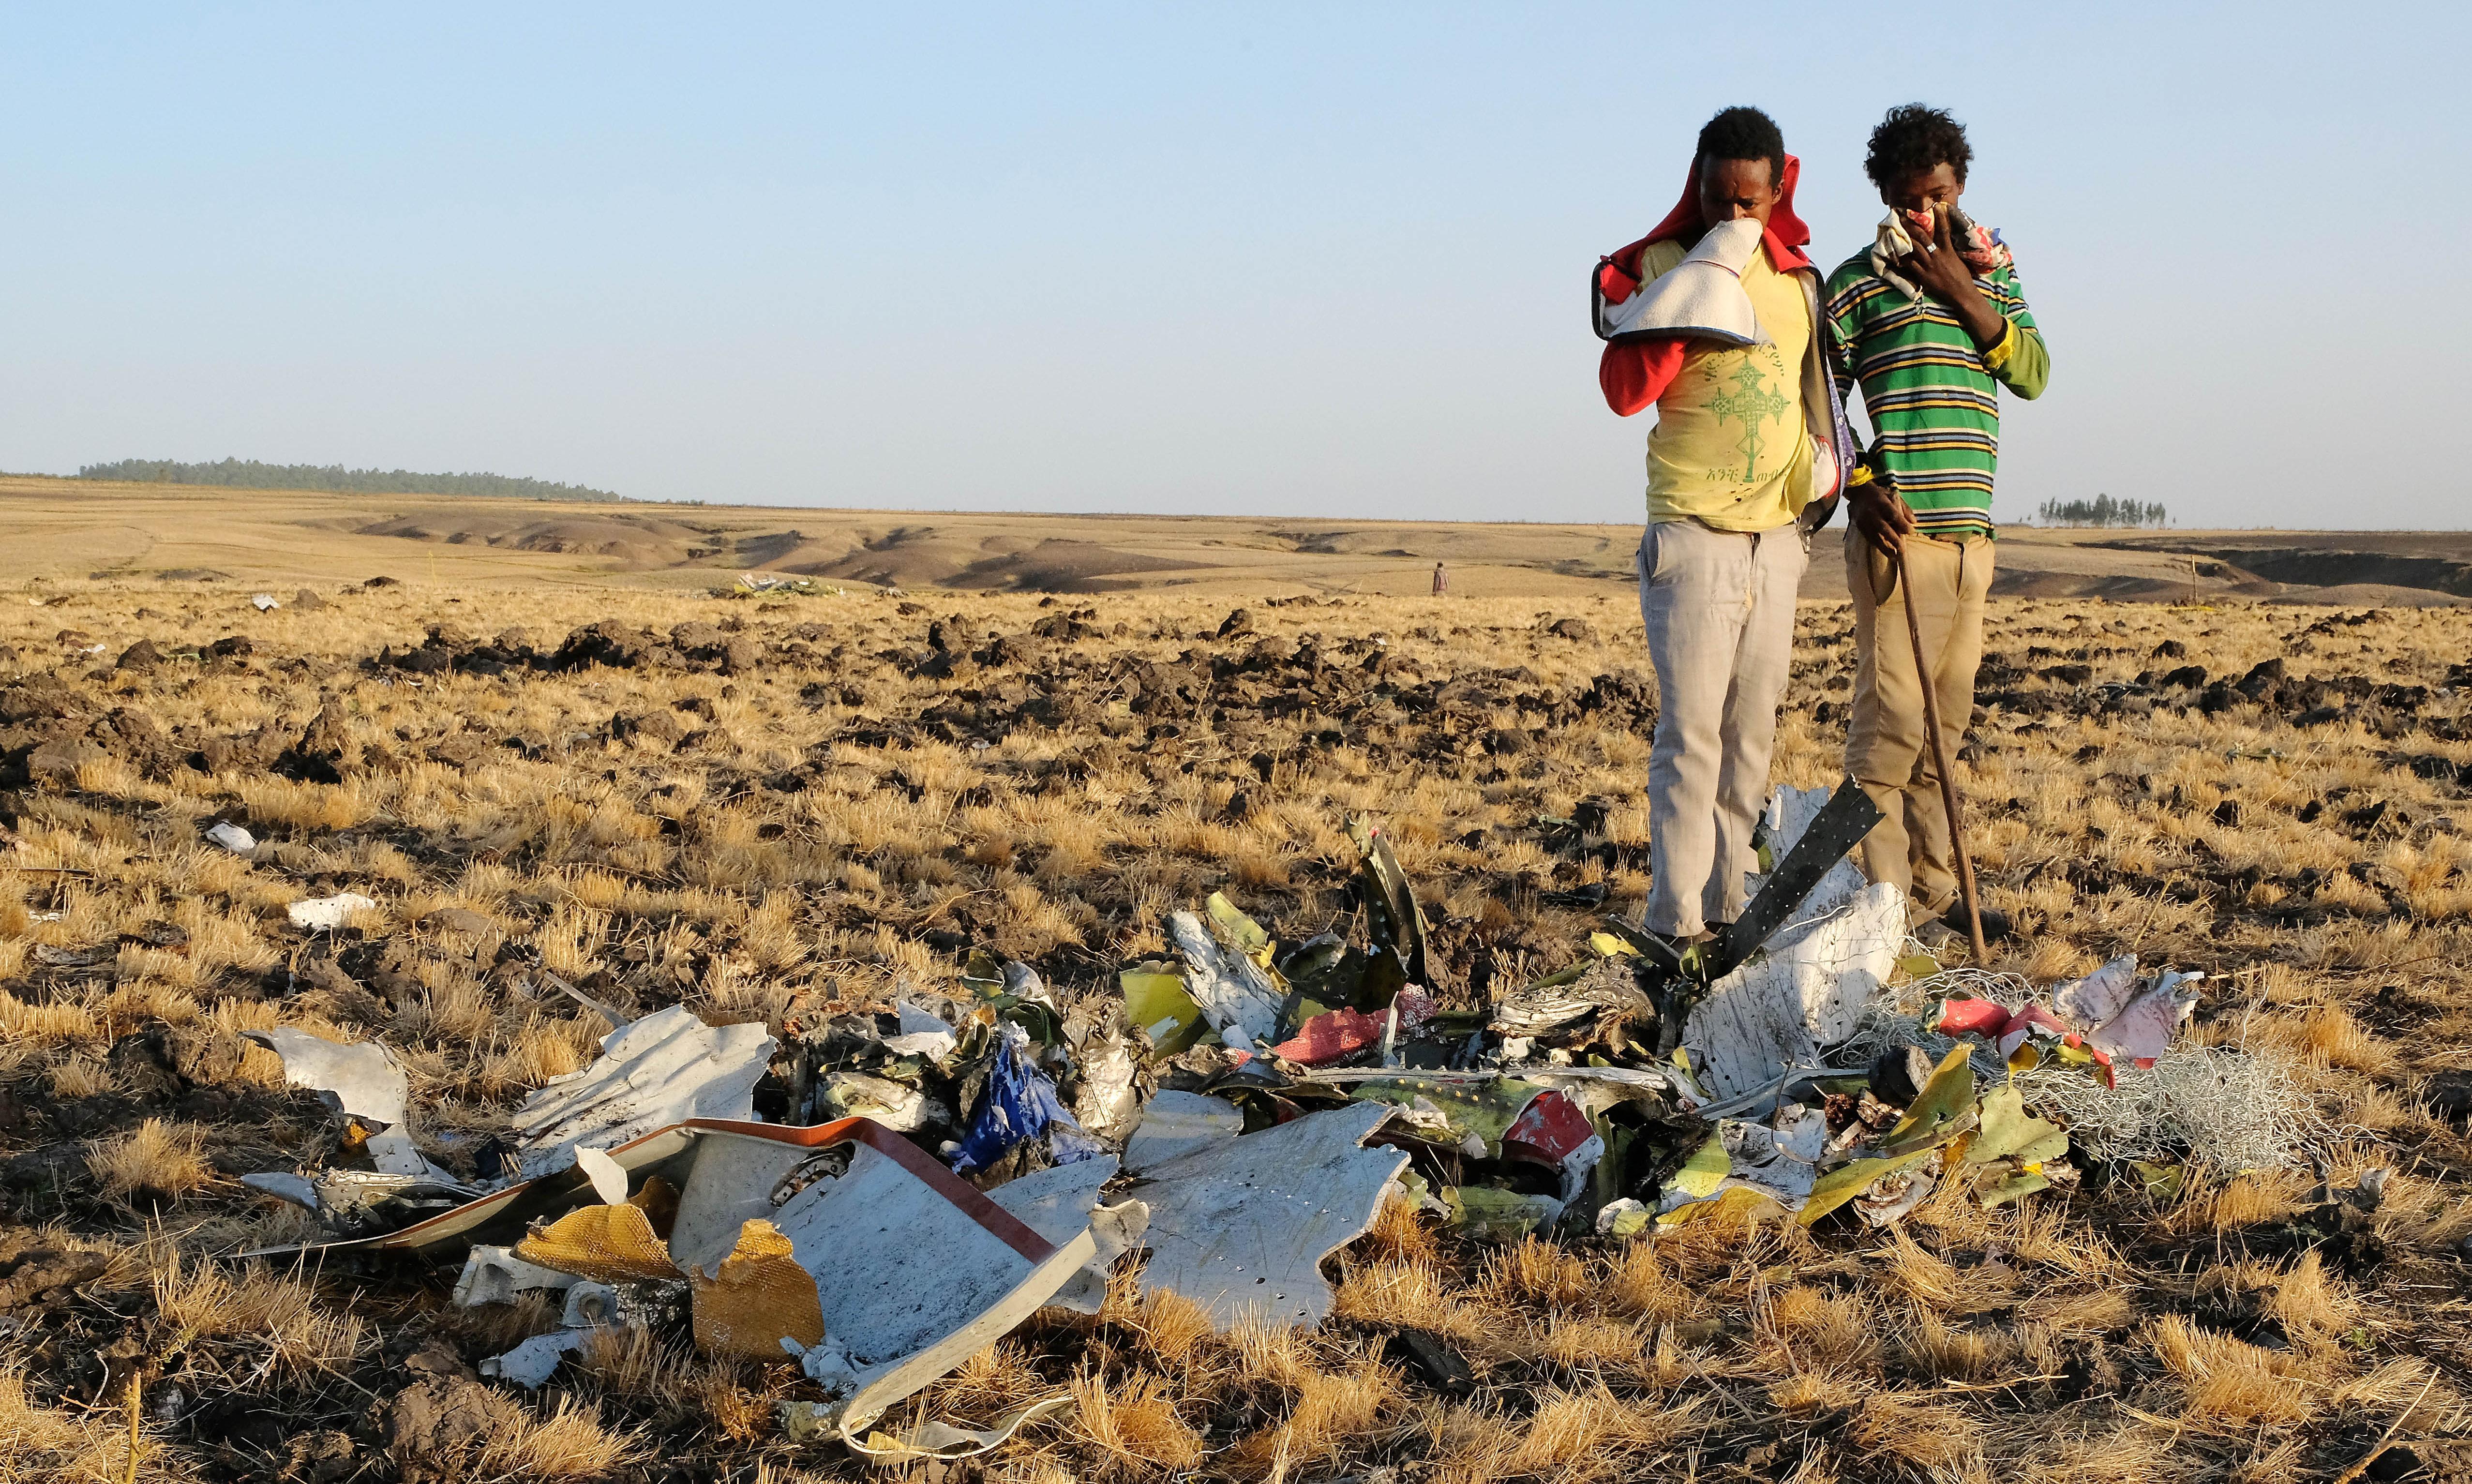 Virgin Australia passengers distressed after screening of ABC report on Ethiopia plane crash